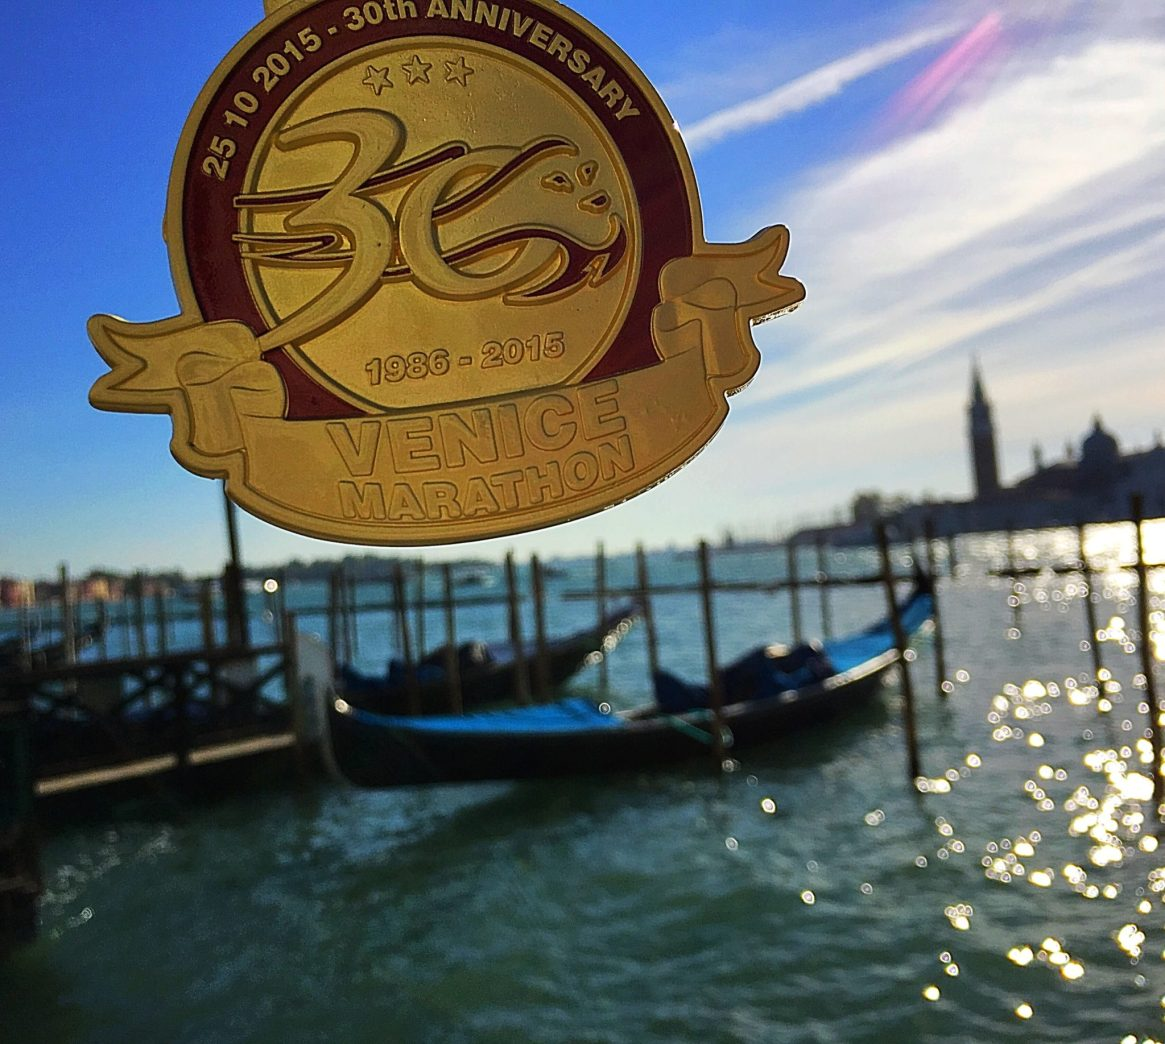 Venice Marathon, 30th Anniversary, Marathon, Venice, Italy, Race Medal